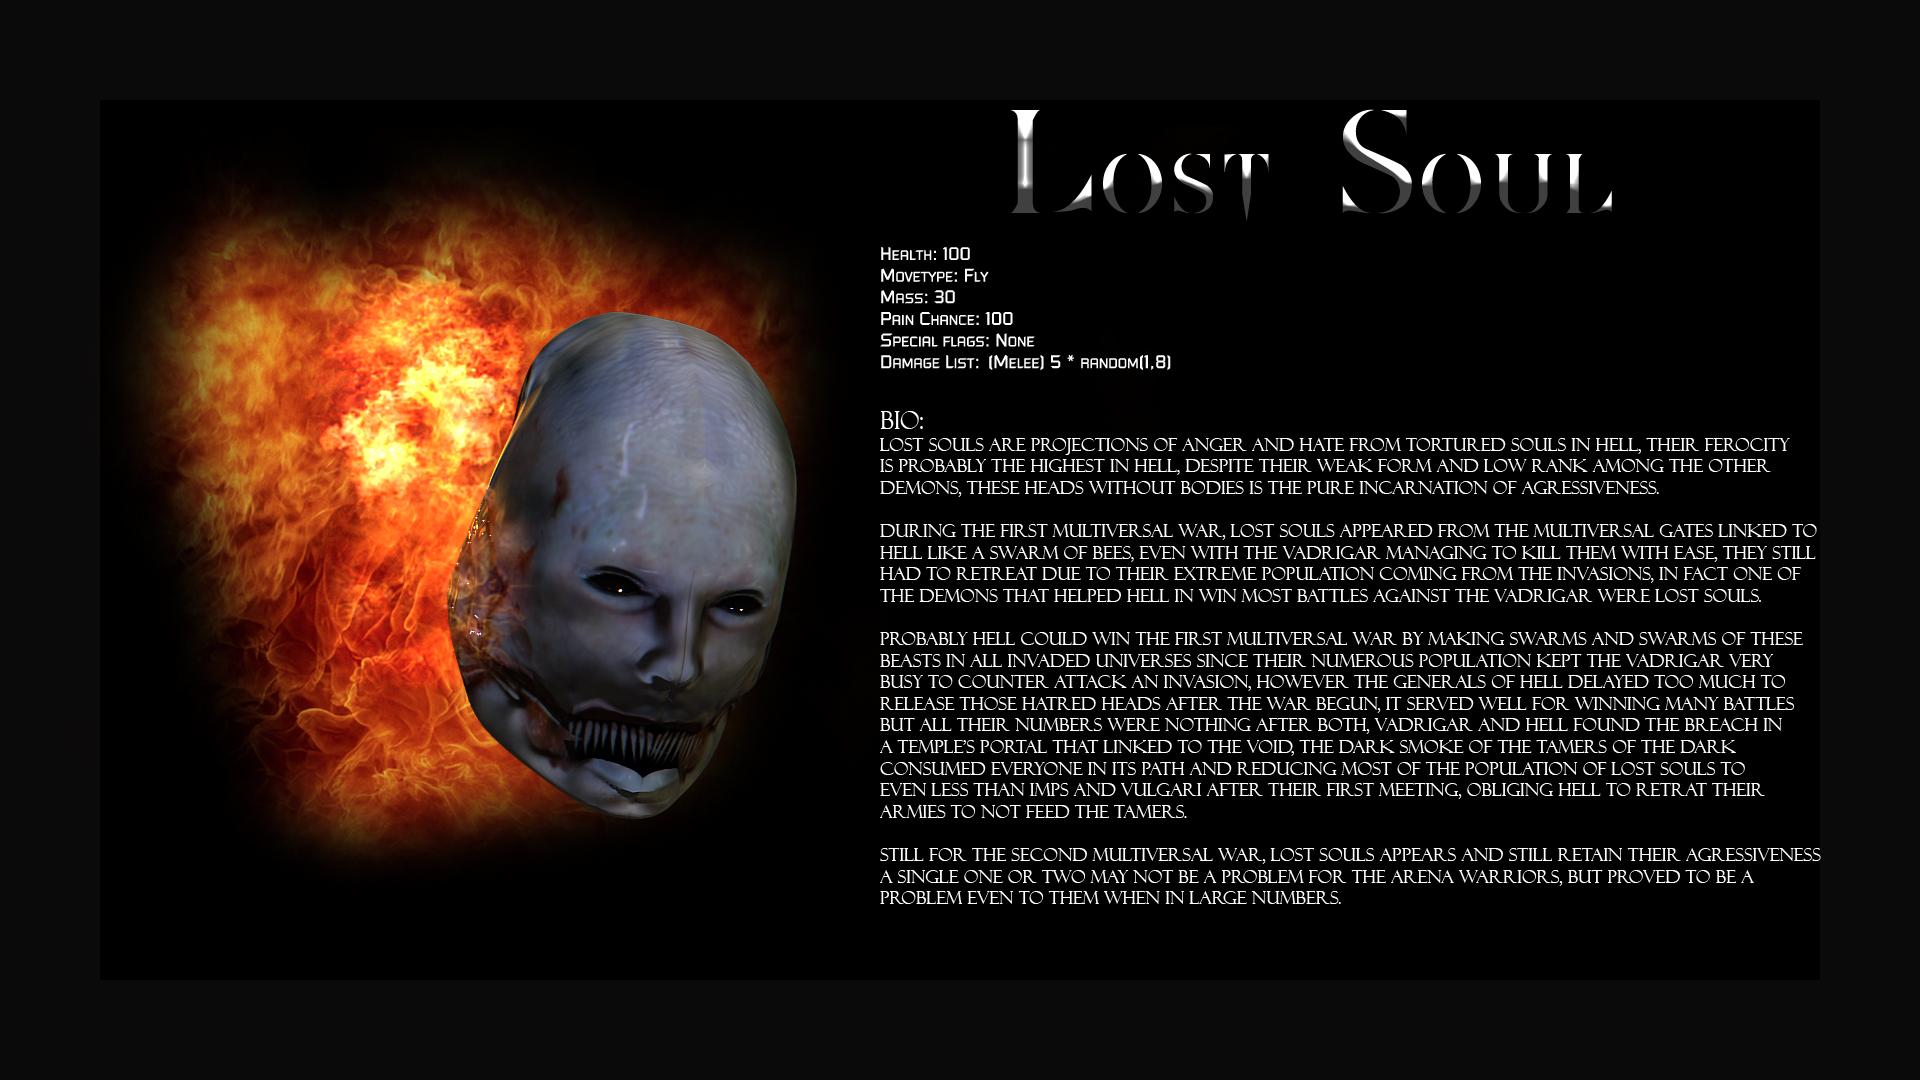 Lost Soul Doom Deviantart: Hunter's Moon Mod For Doom